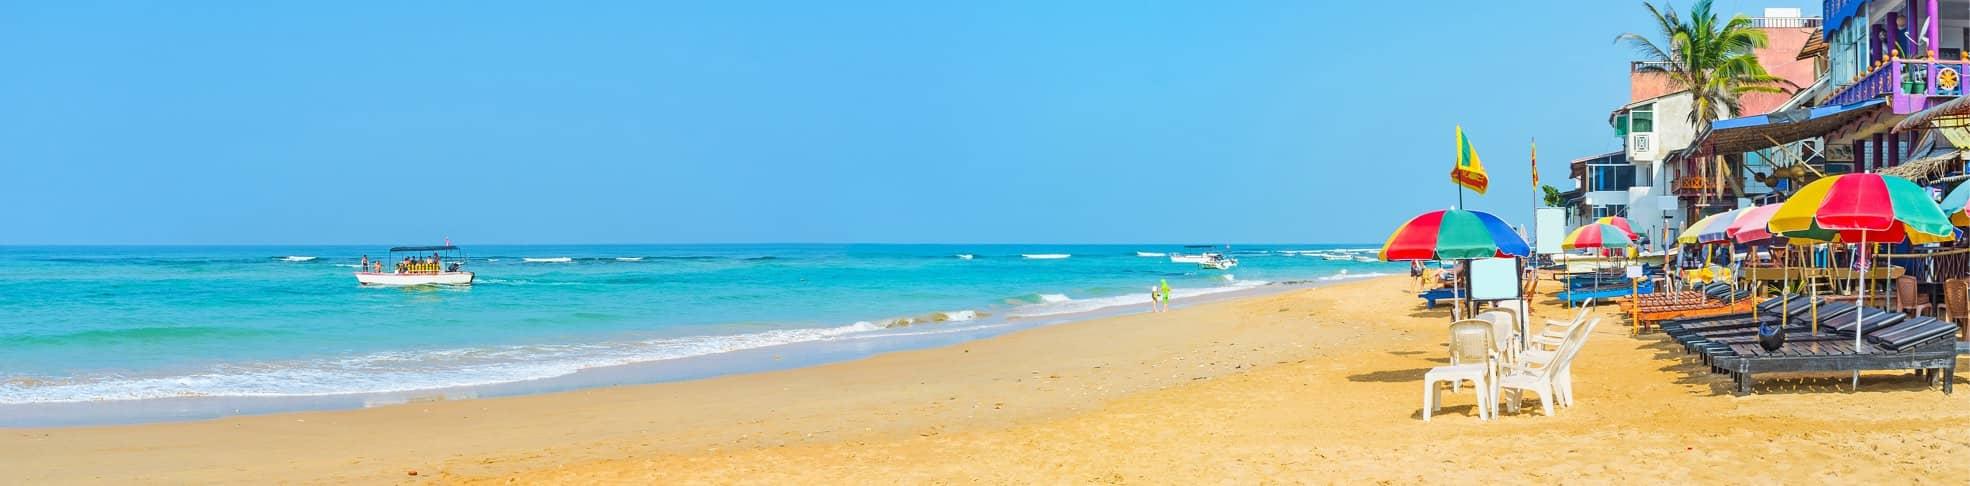 Cheap Sri Lanka Holidays 2019 2020 From 163 49 Deposit Only